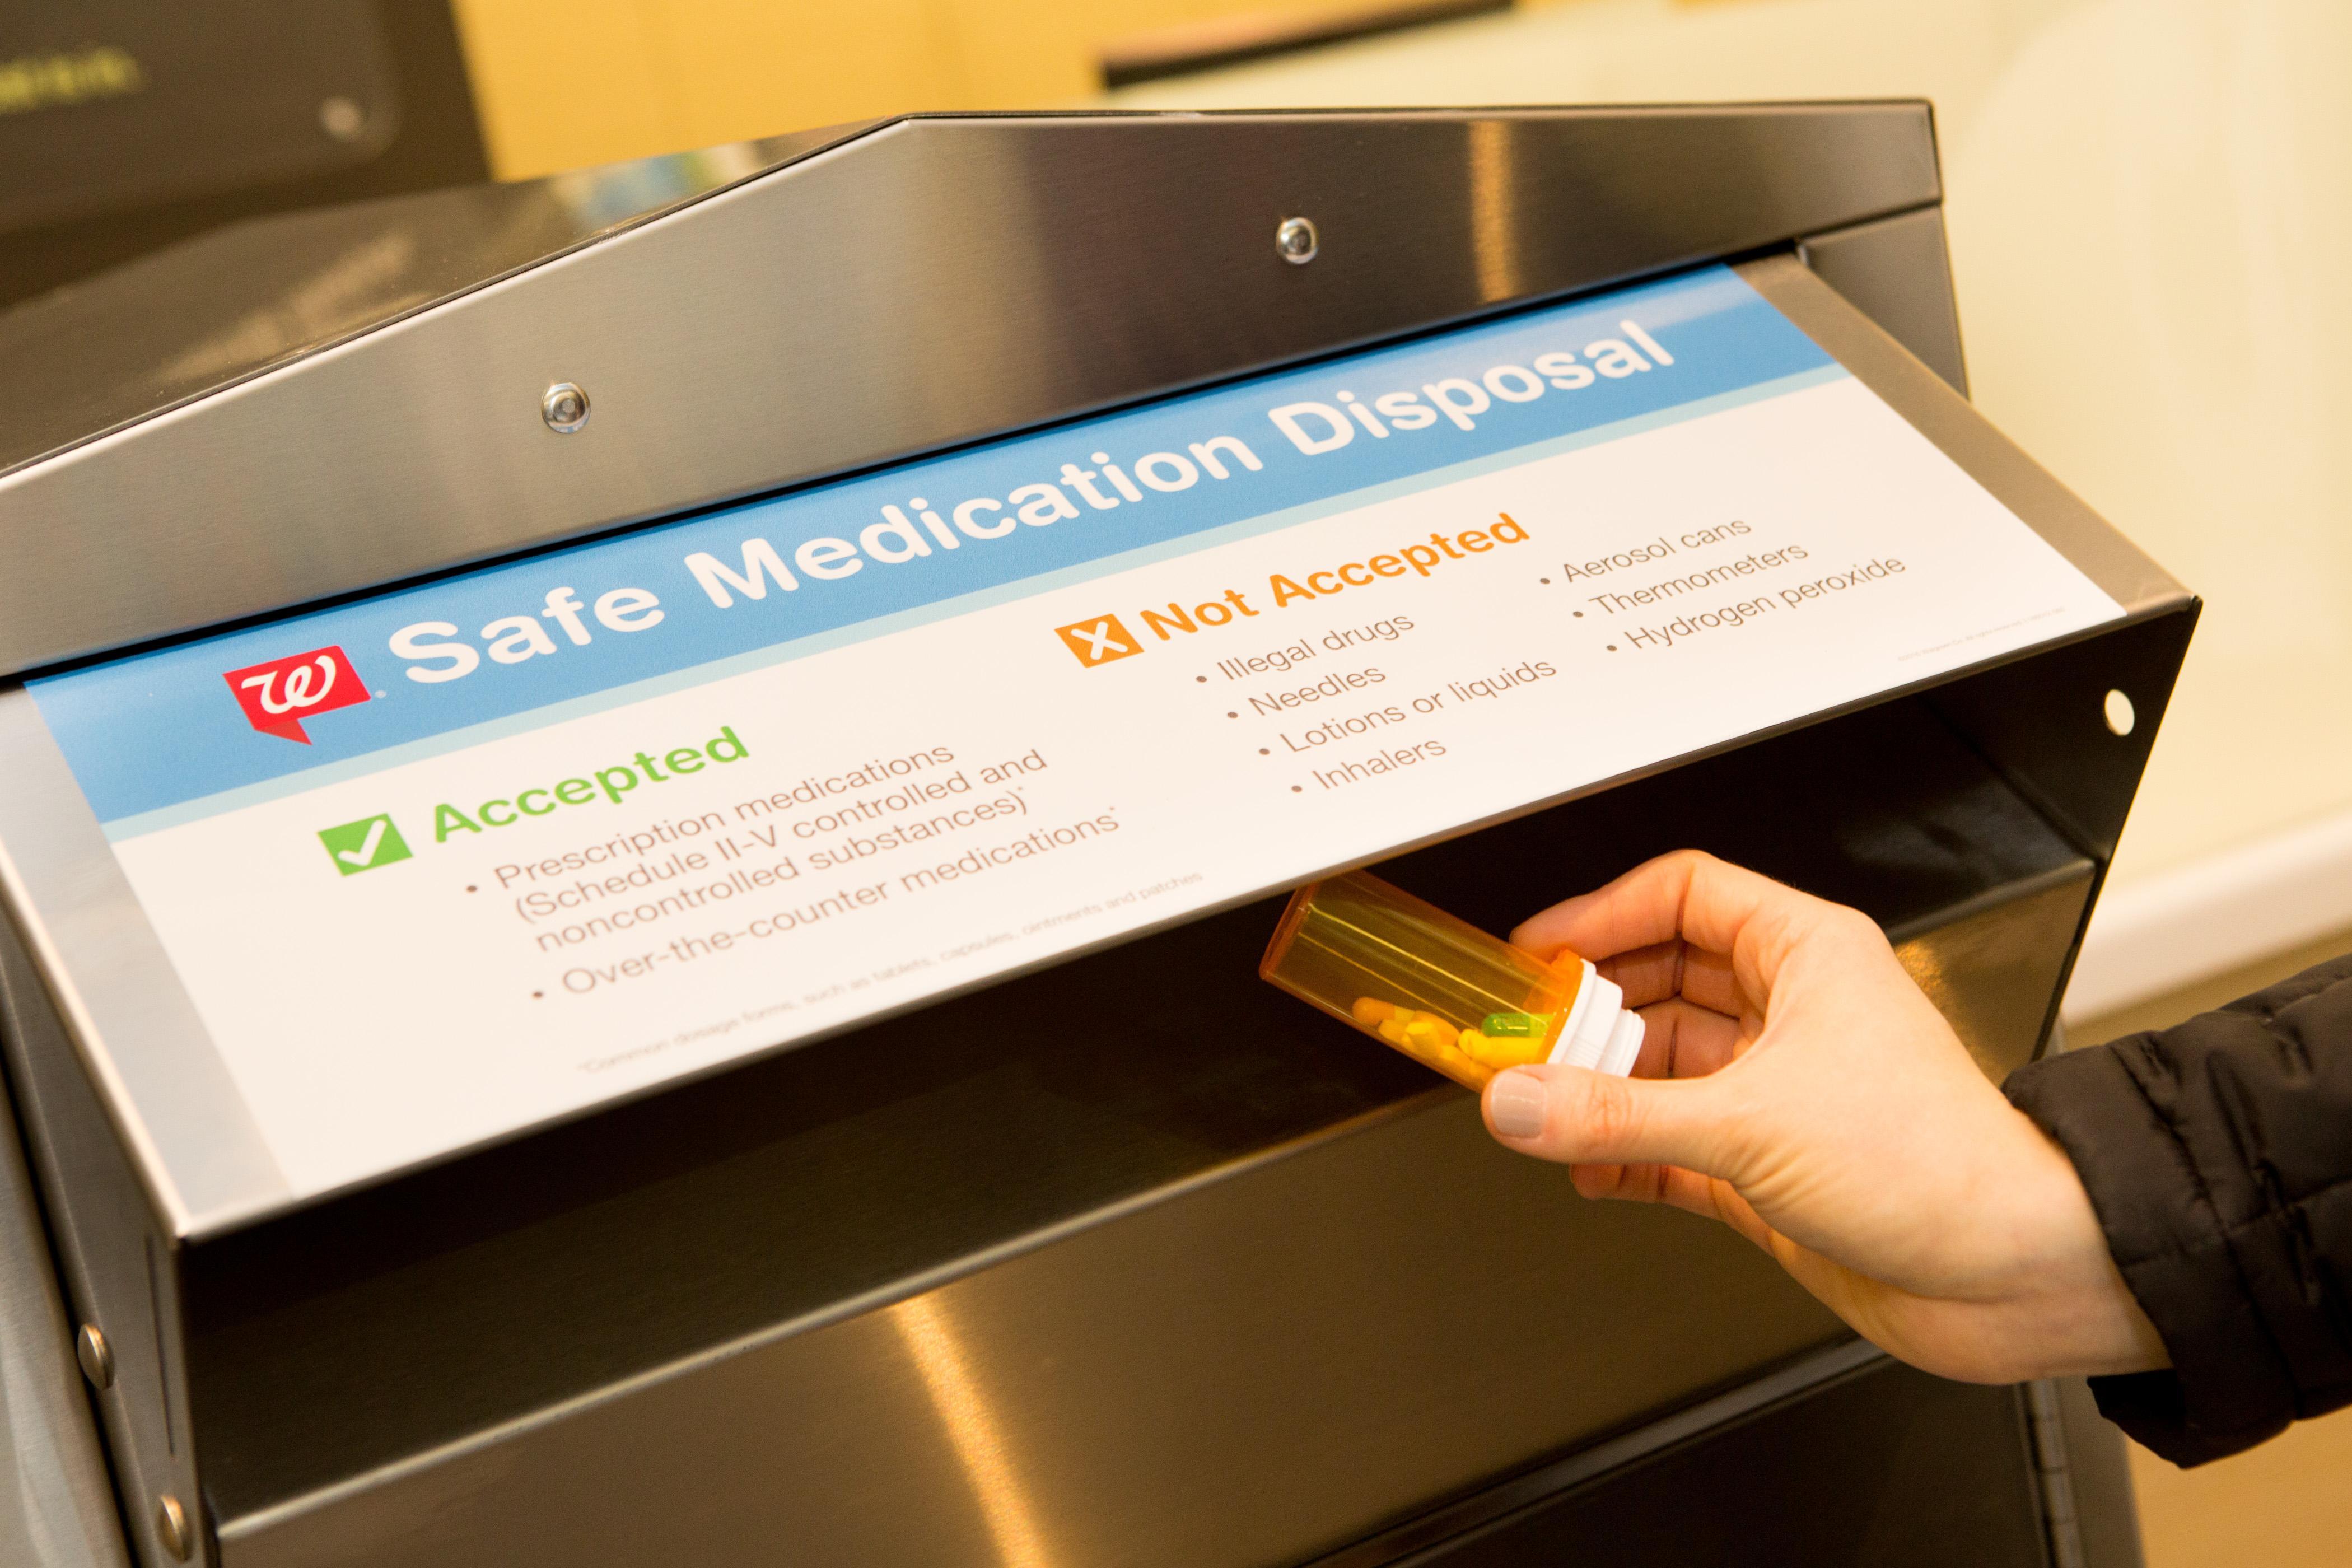 safe medication disposal kiosks will soon be available at 10 walgreens stores in washington - Walgreens Prescription Discount Card